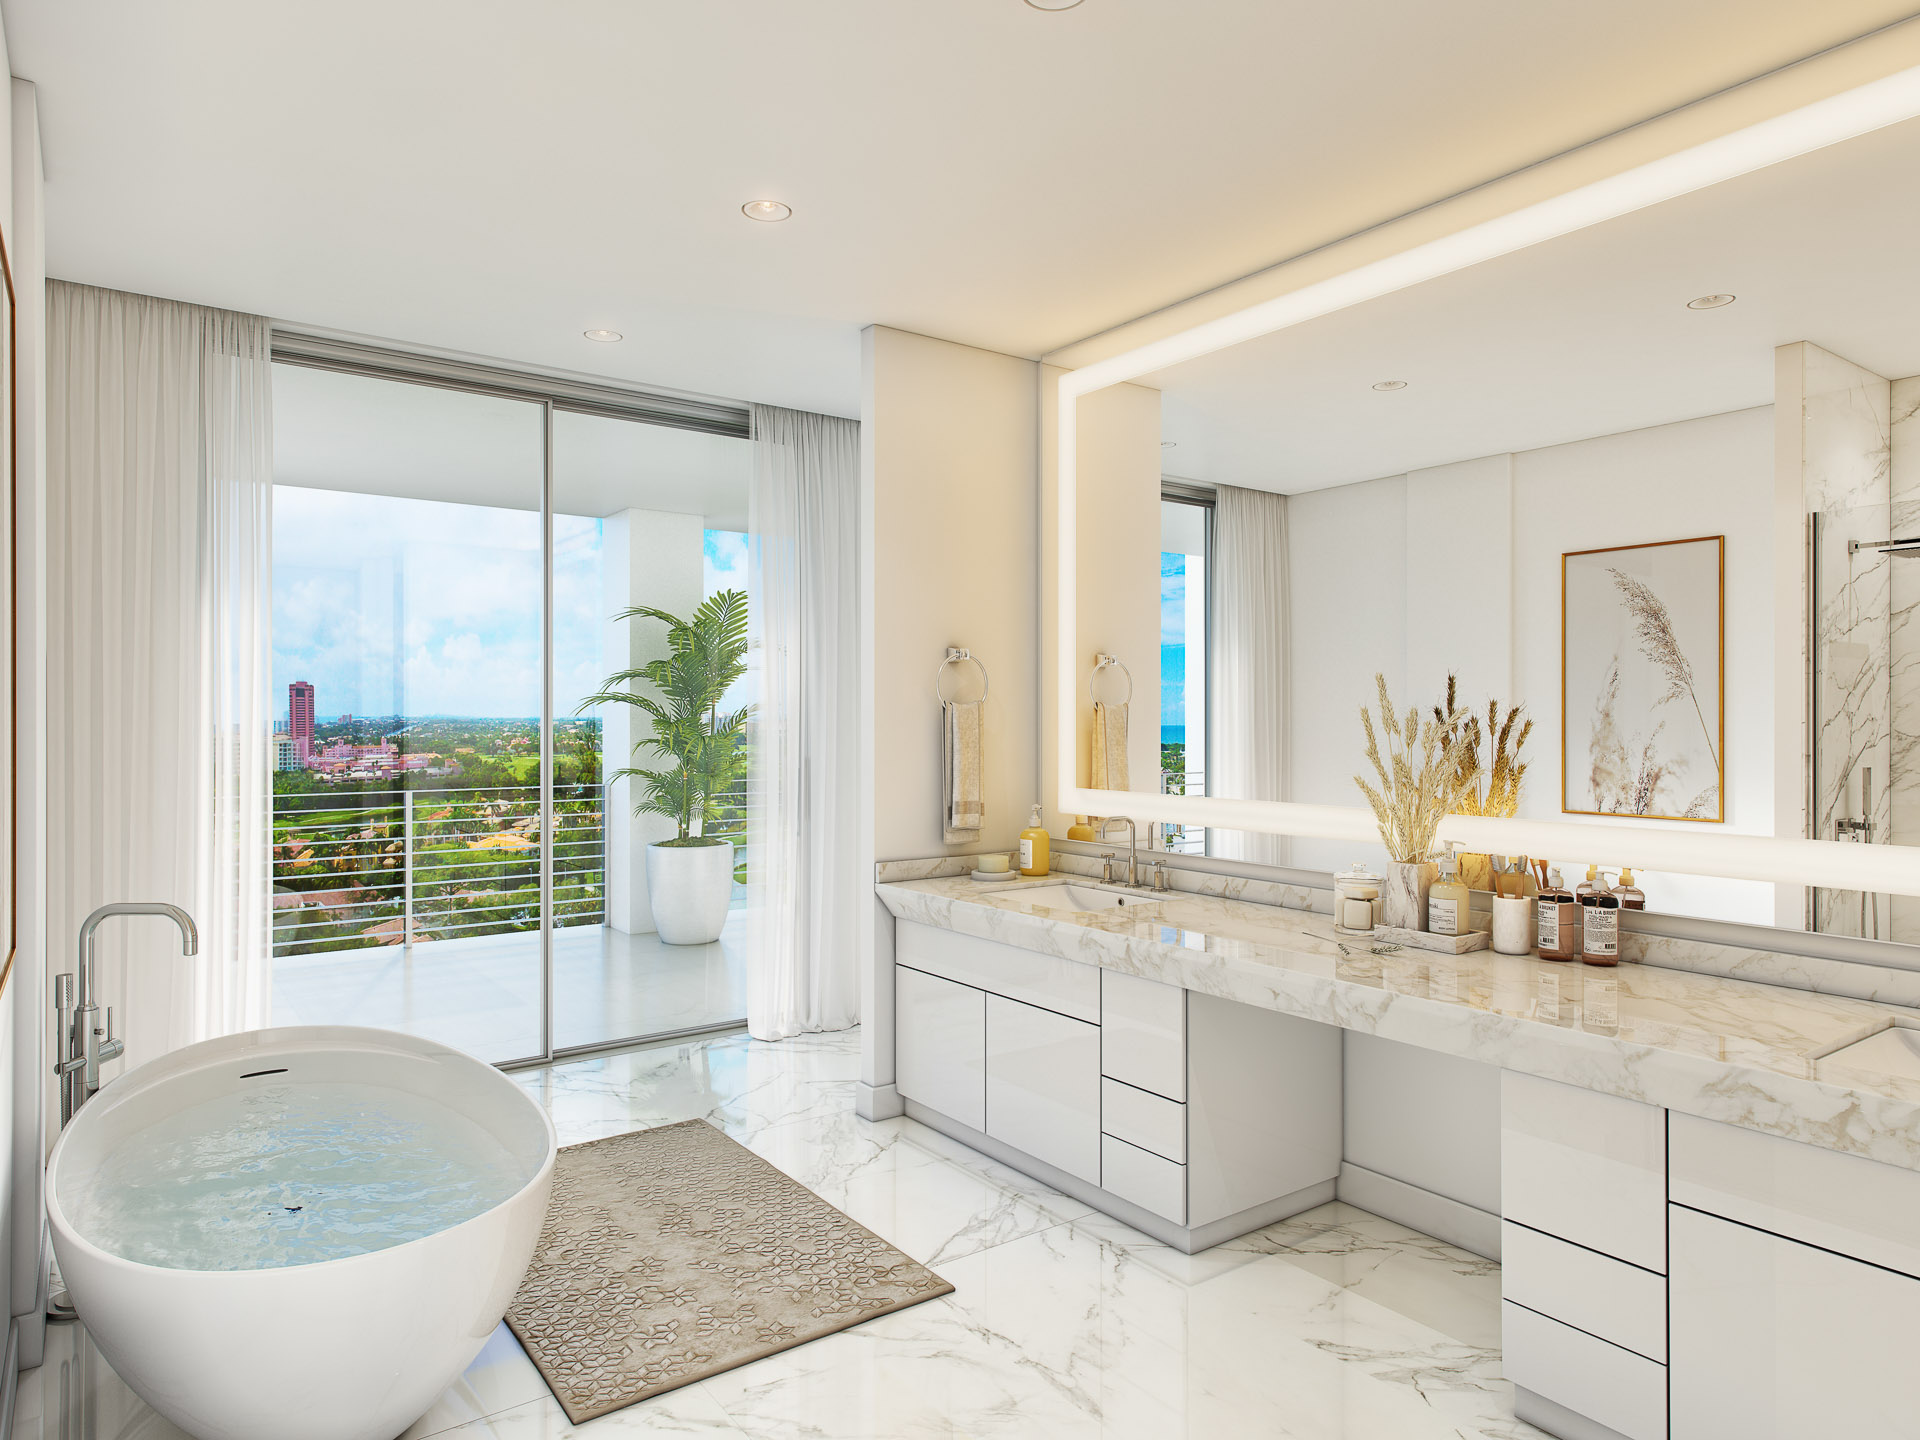 475RoyalPalm_Interior_TowerC_UnitC202_Bathroom_Cam1_HD_122118